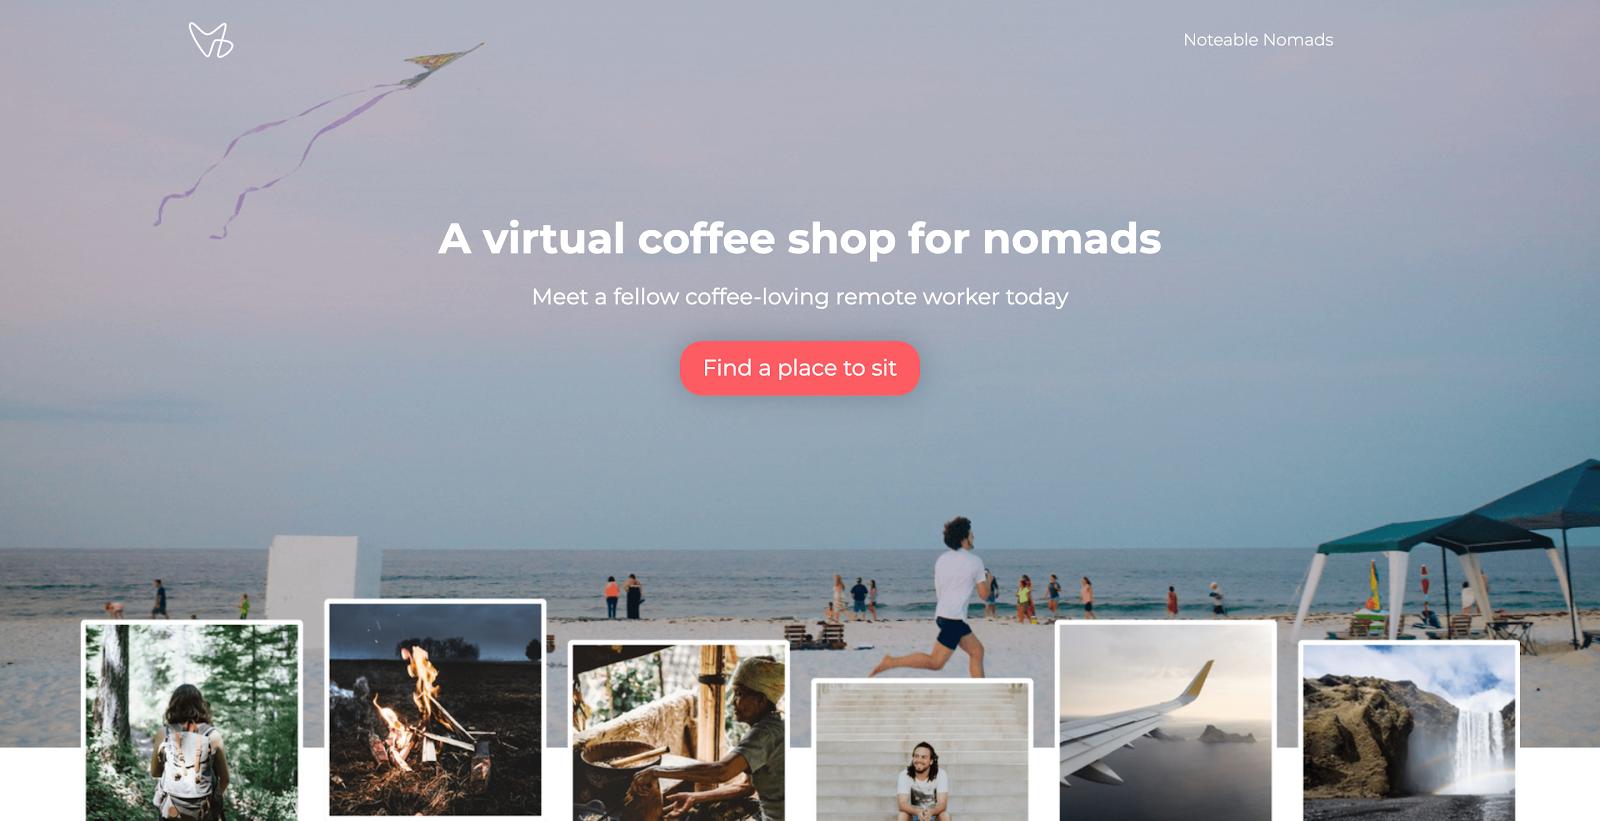 Noteable Nomads Website